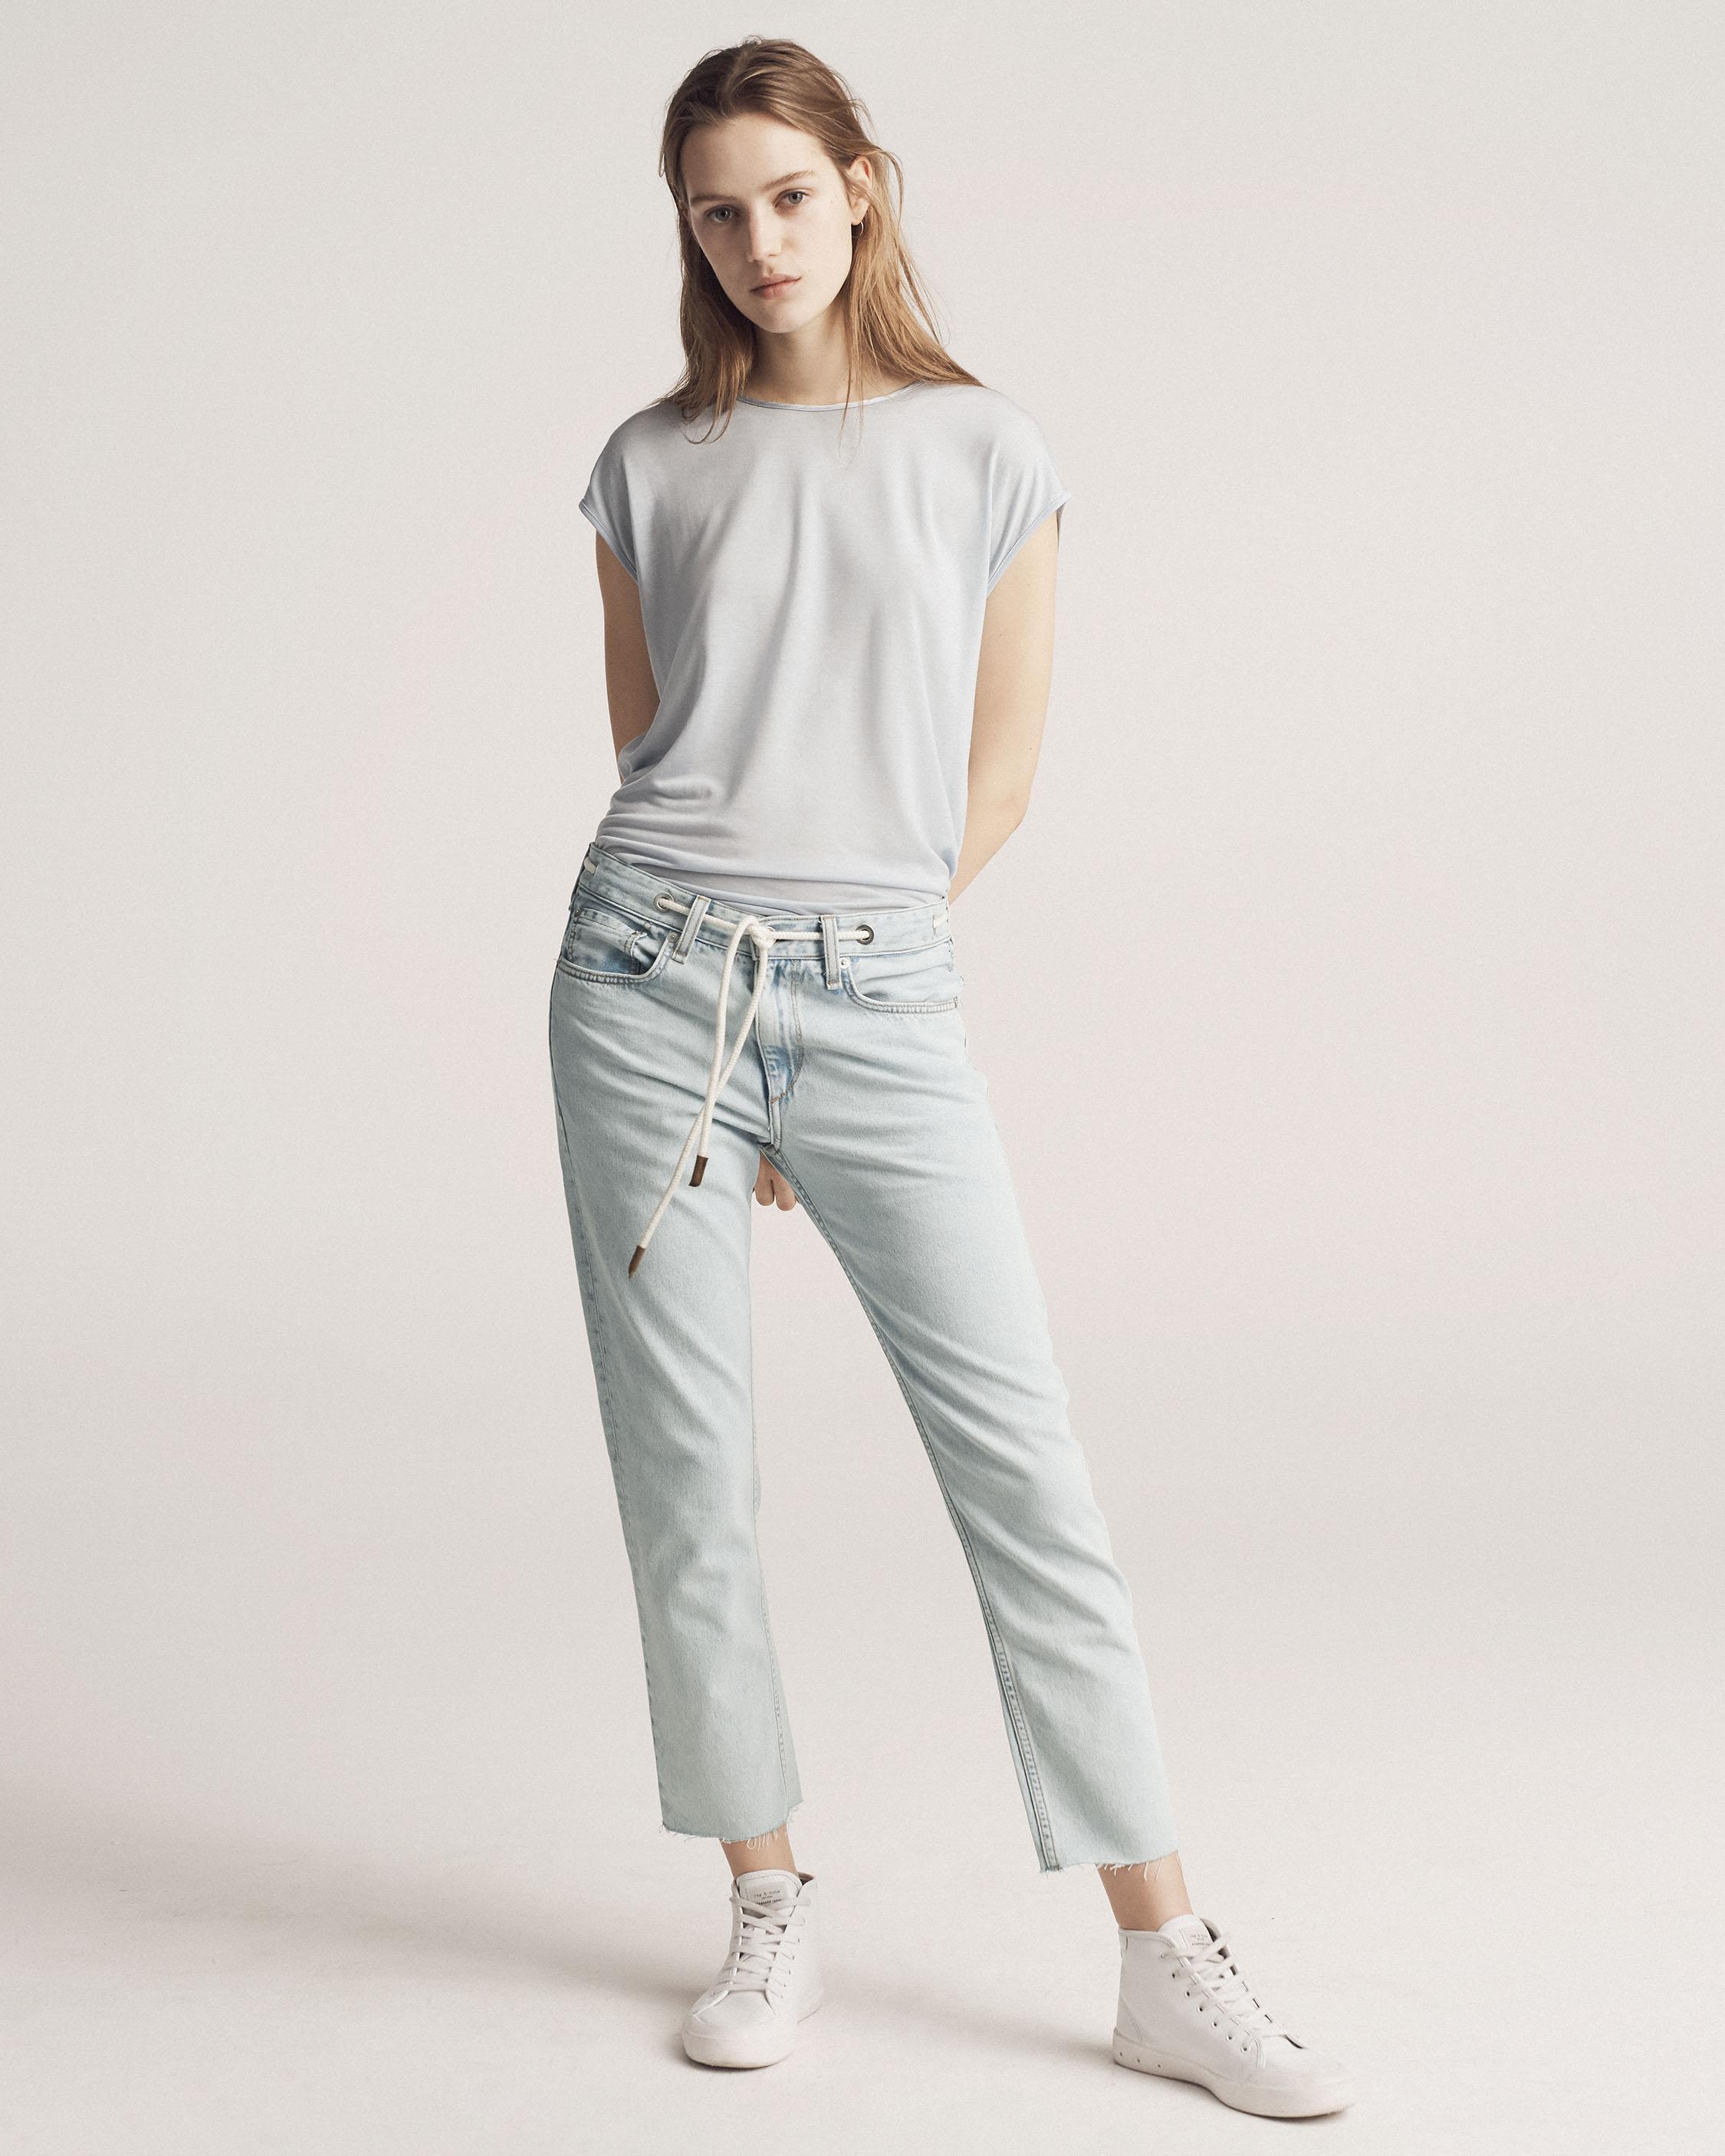 Enjoy For Sale Fashion Style Cheap Price Rocklyn cropped jeans Rag & Bone Outlet Fake PqAtVT